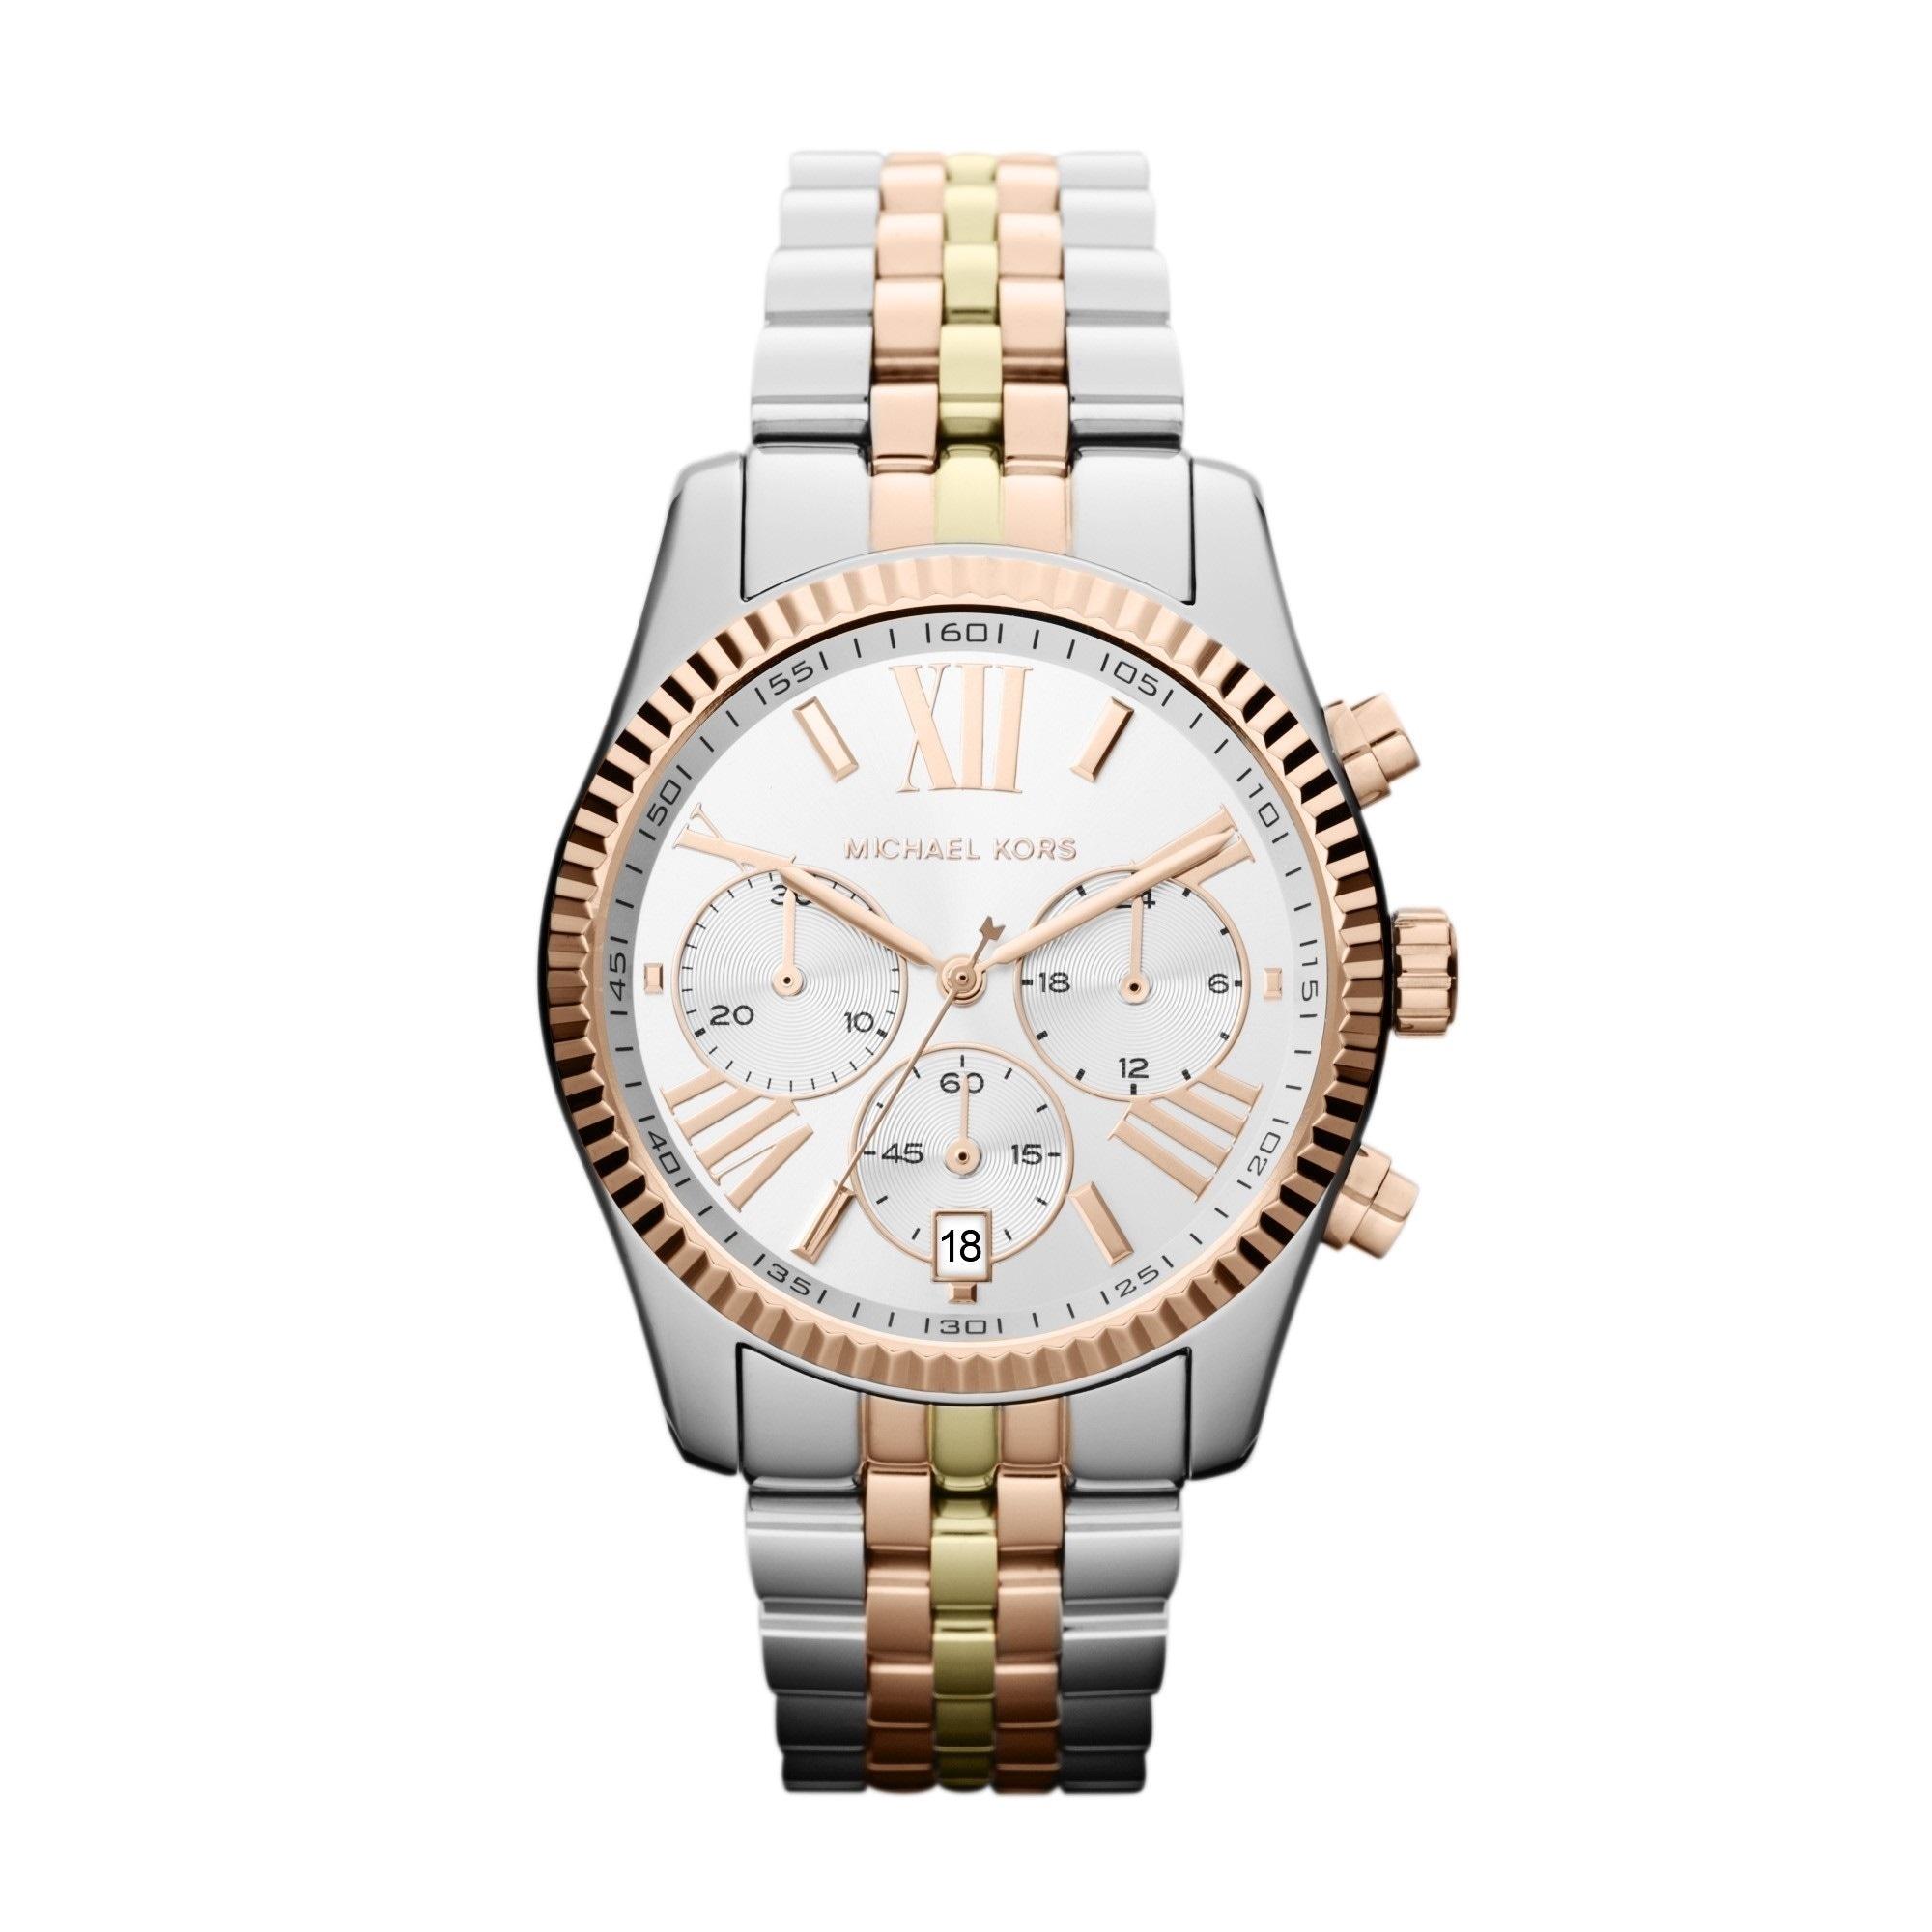 9f62e527be08 Shop Michael Kors Women s Lexington MK5735 Watch - WHITE GOLD - WHITE GOLD  - Free Shipping Today - Overstock - 8202470